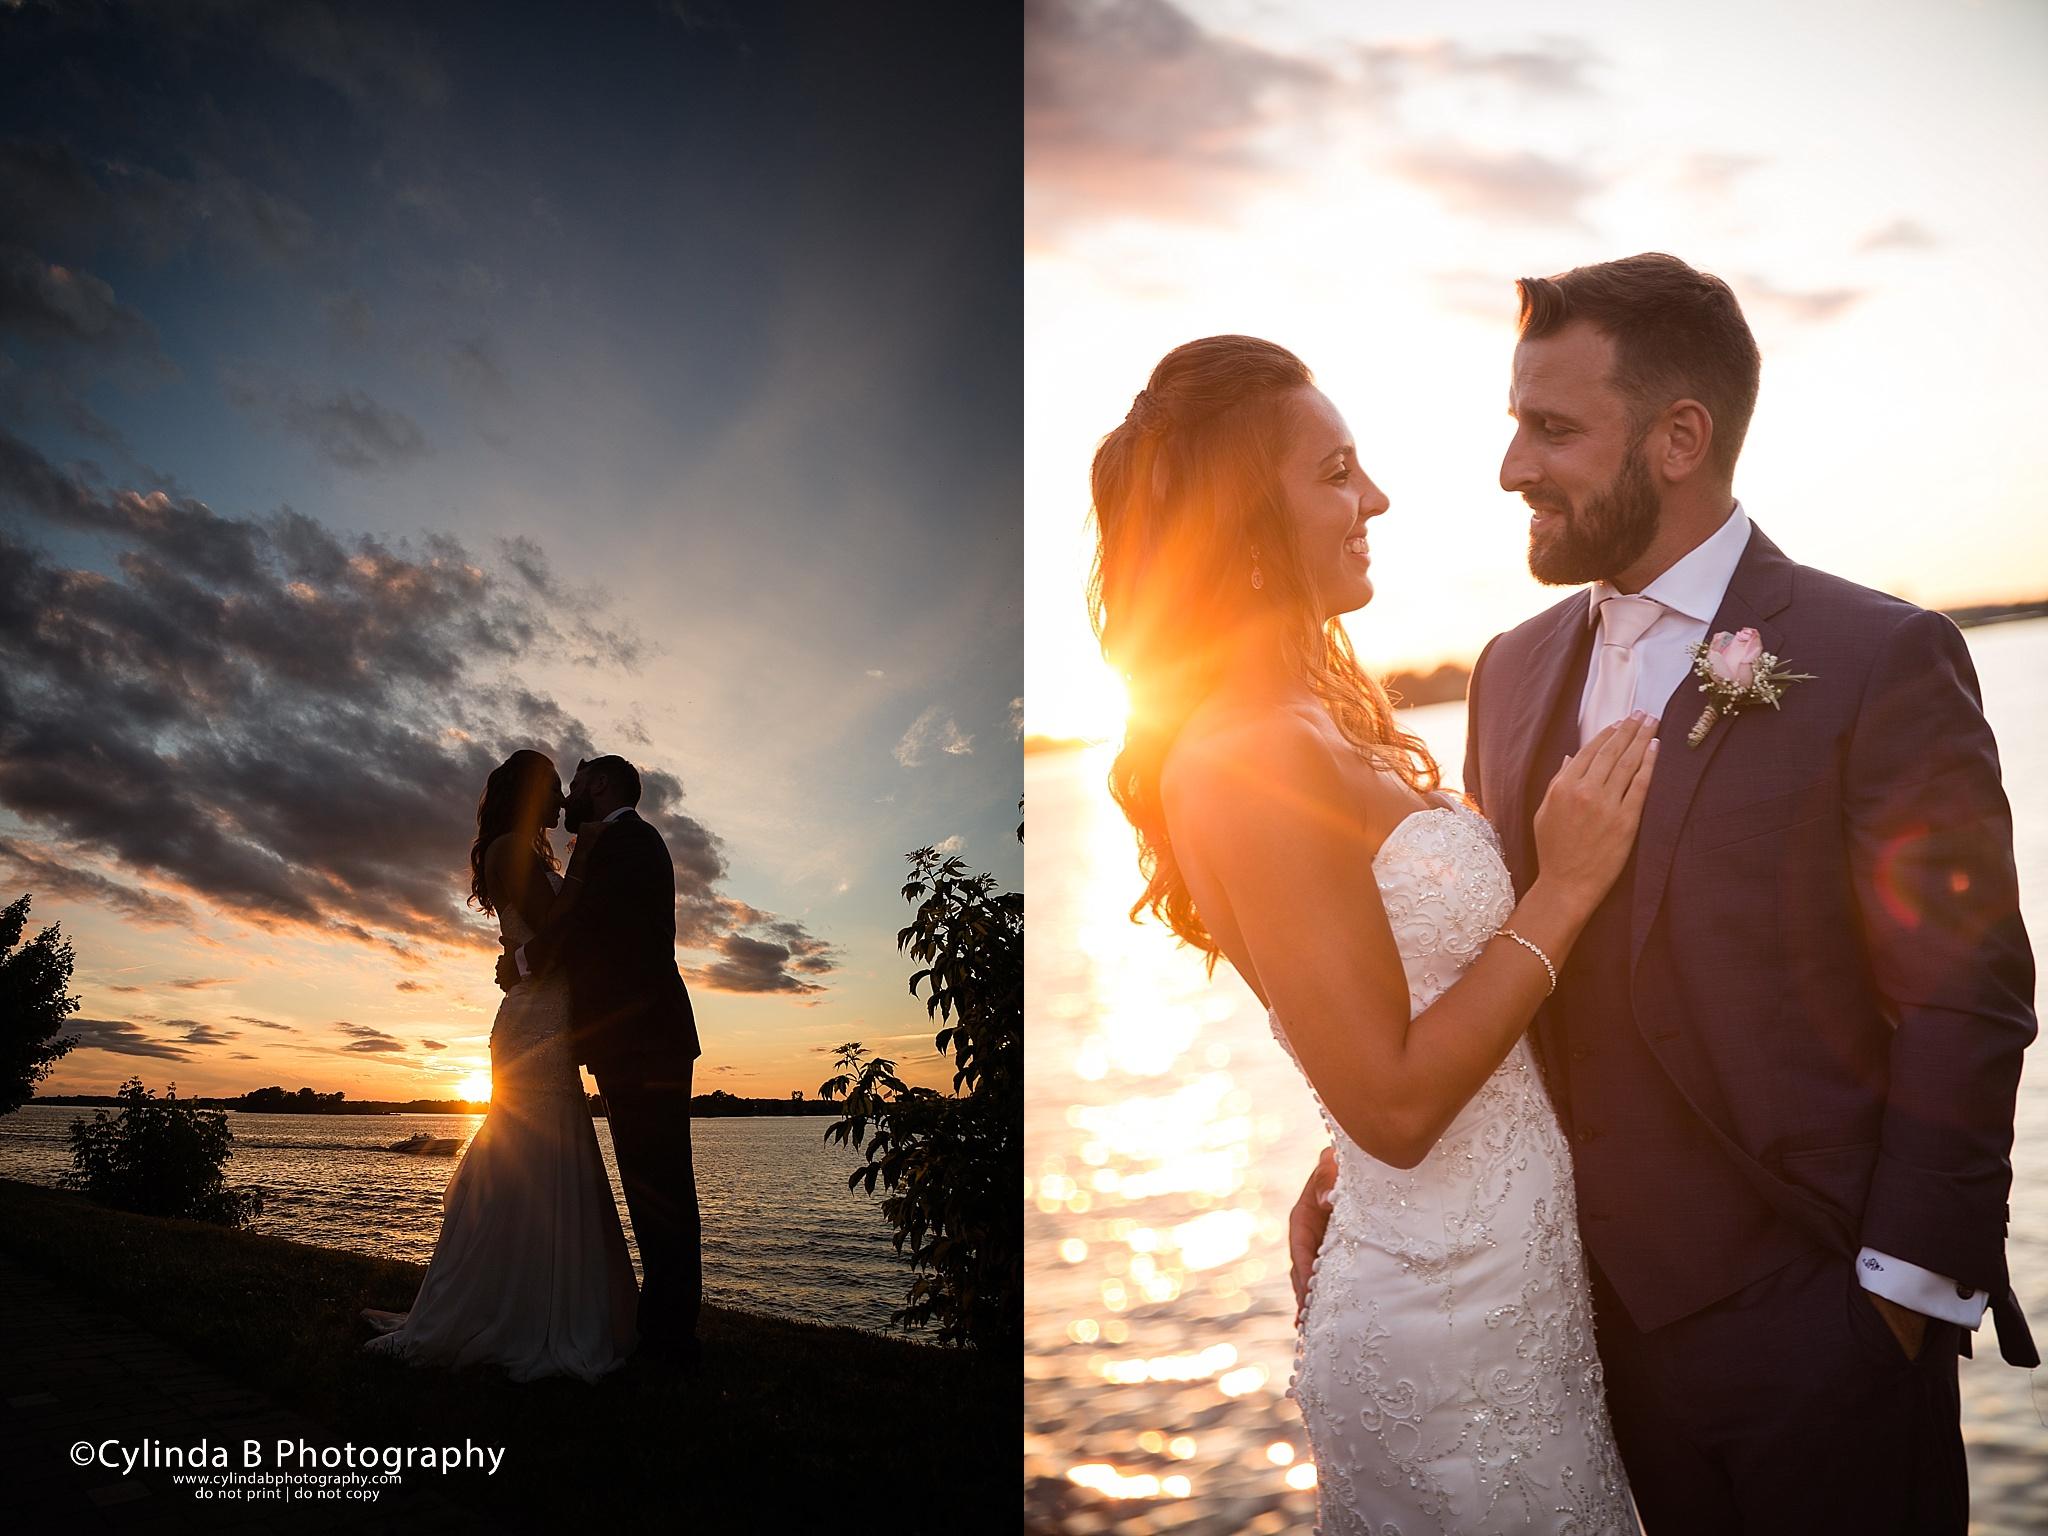 Boldt Castle Wedding, Alexandria Bay, Wedding, Photograper, Cylinda B Photography-38